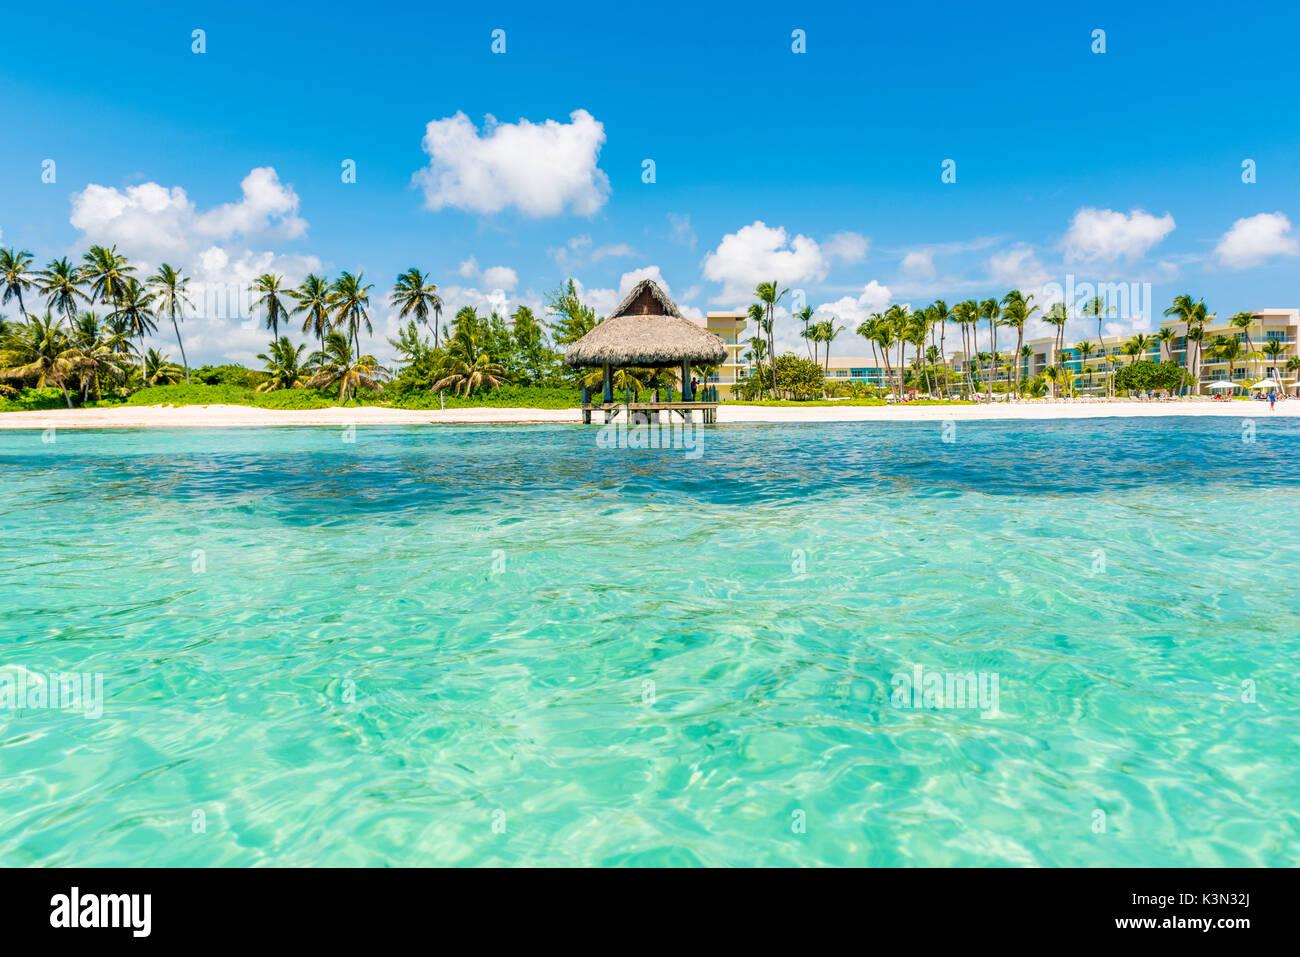 Playa Blanca, Punta Cana, República Dominicana, Mar Caribe. Choza de paja en la playa. Foto de stock